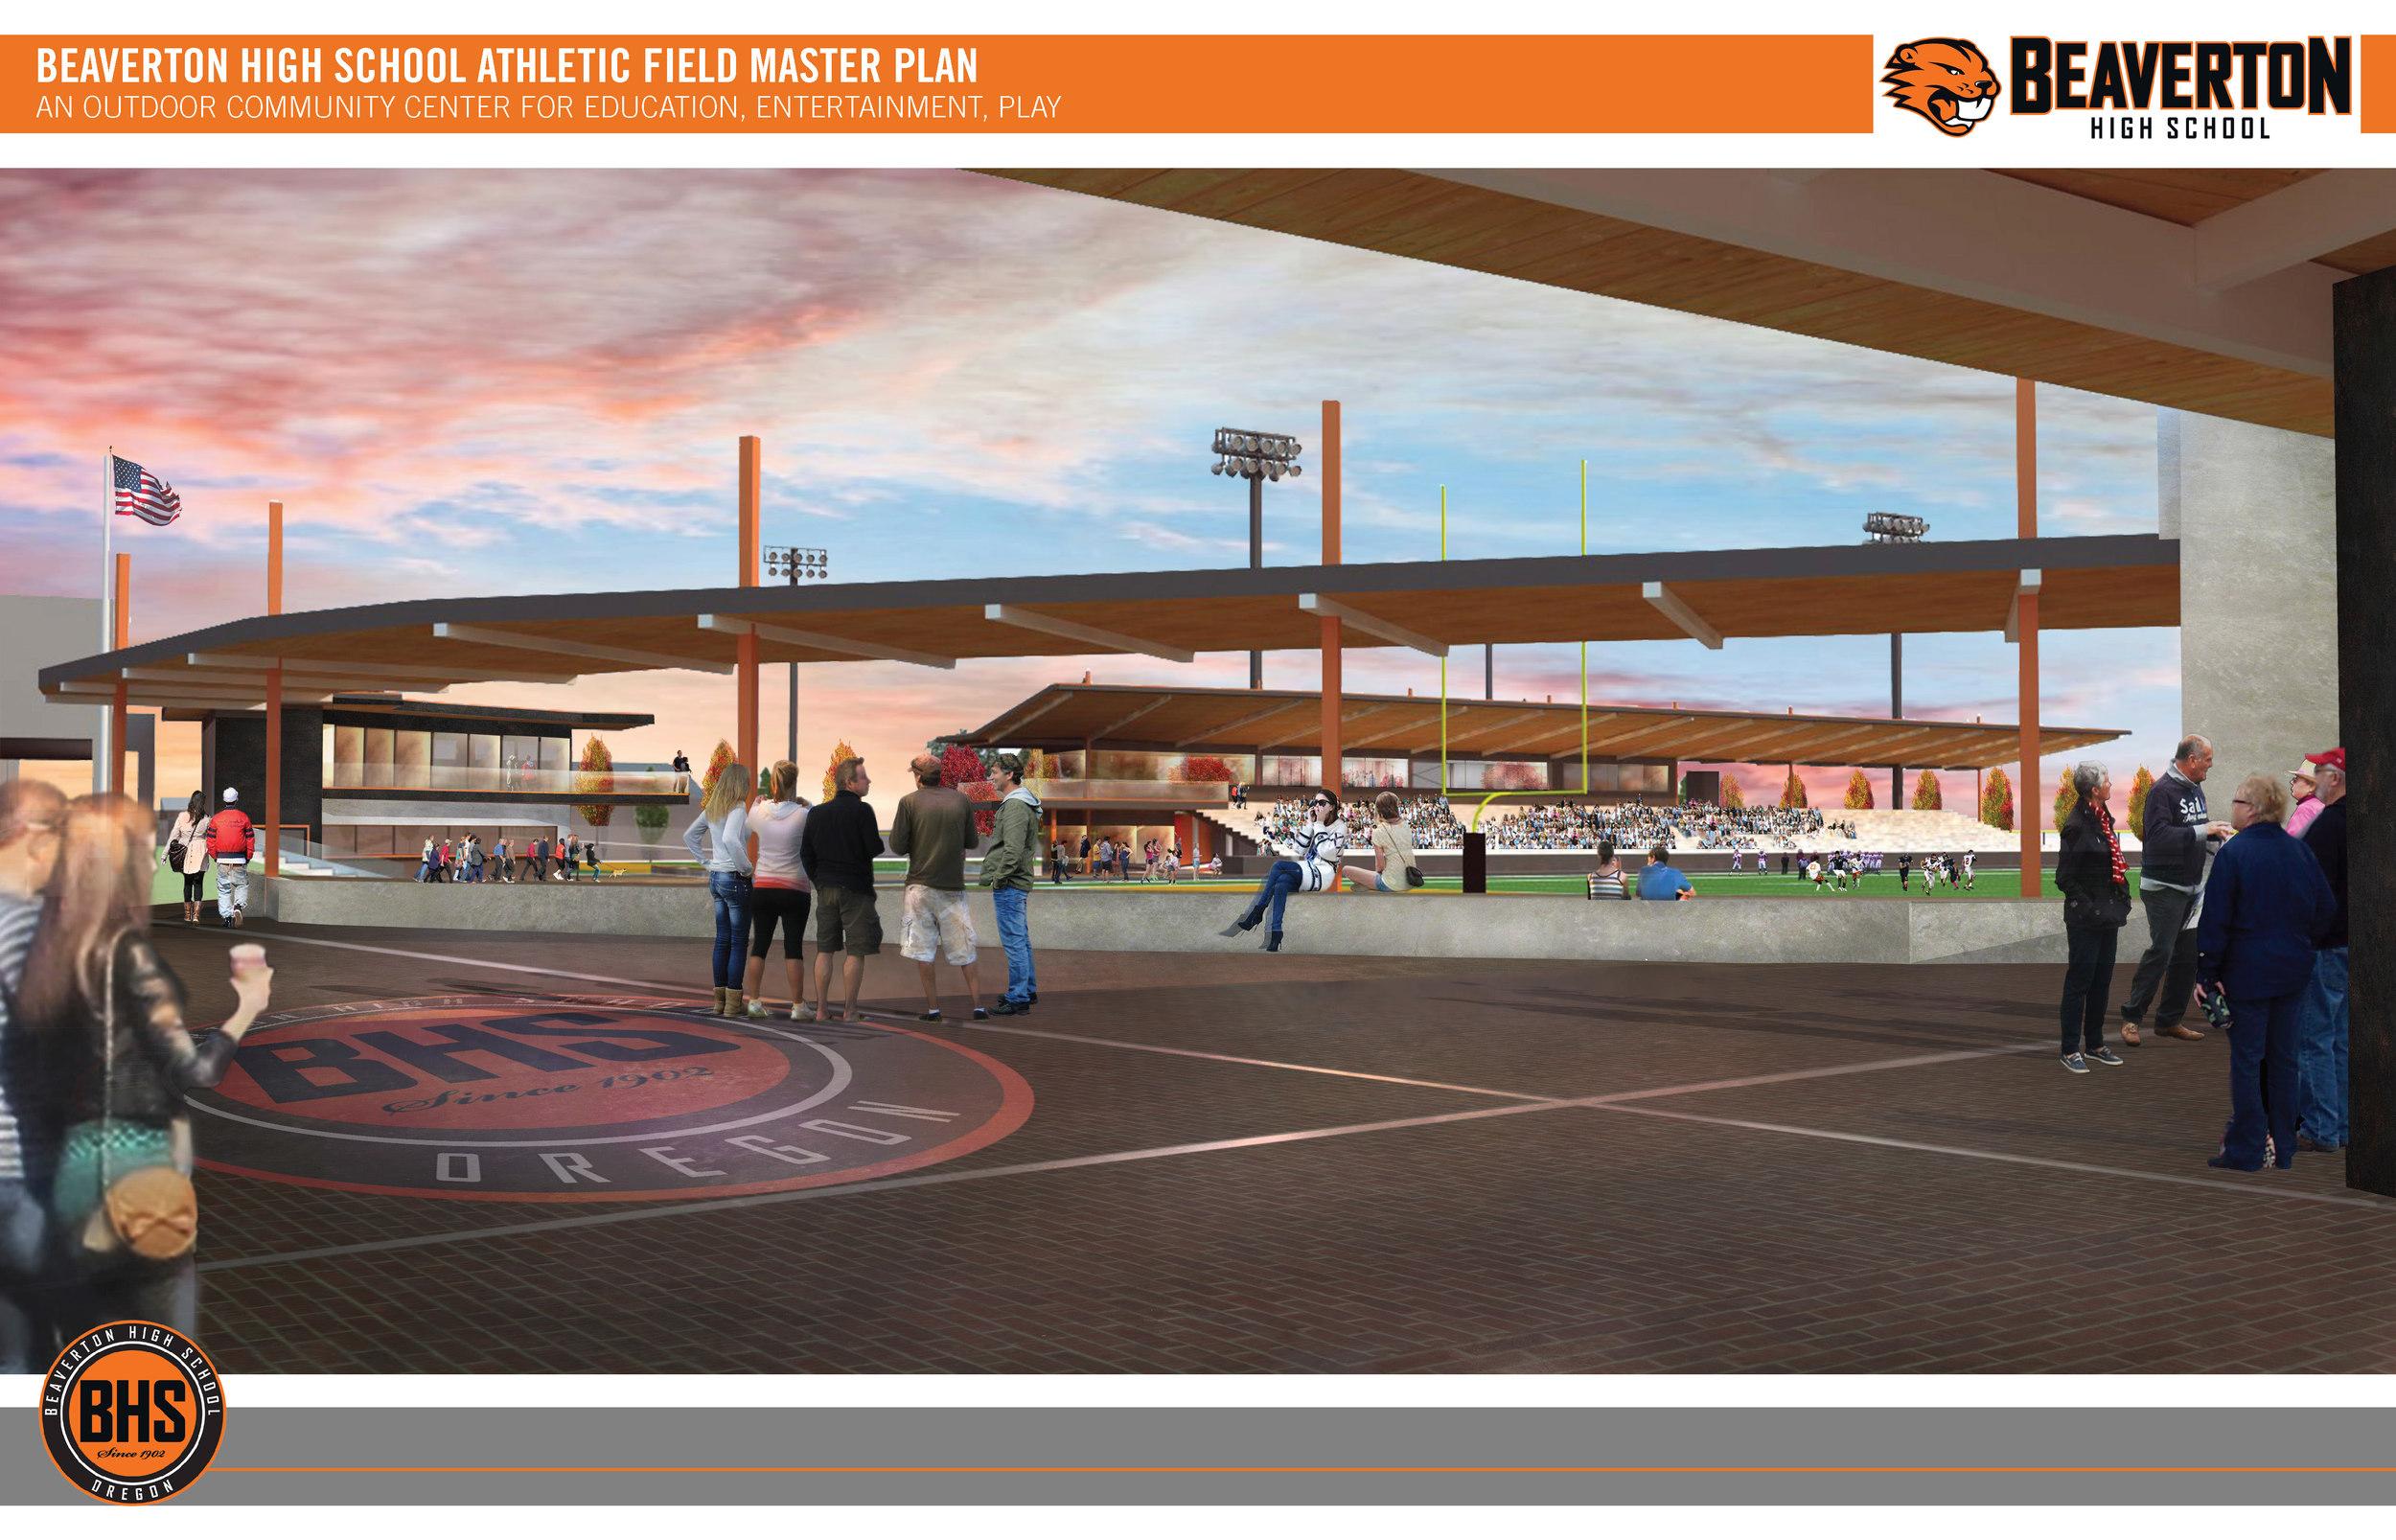 Beaverton High School Master Plan